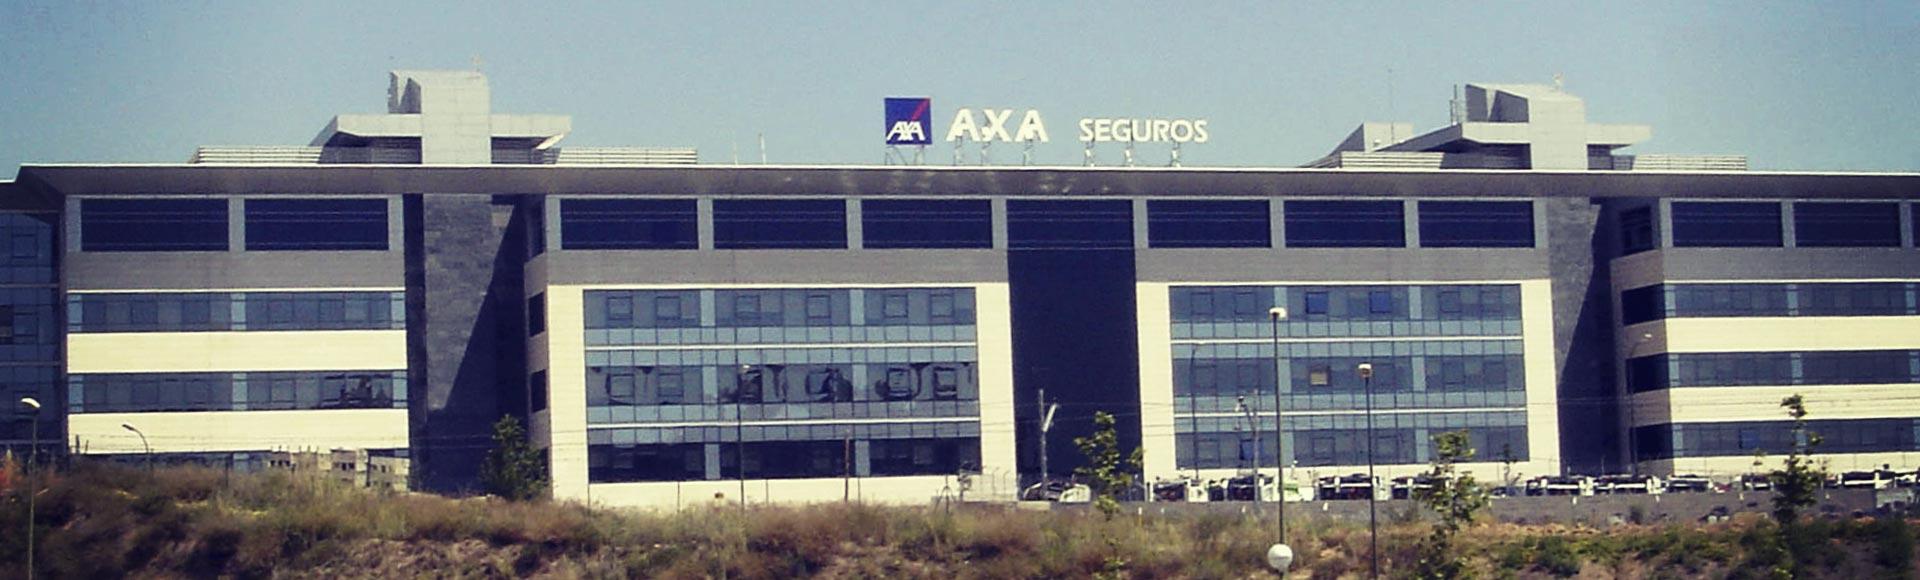 Riesgo y seguro videos de divulgaci n magazine for Axa seguros sevilla oficinas